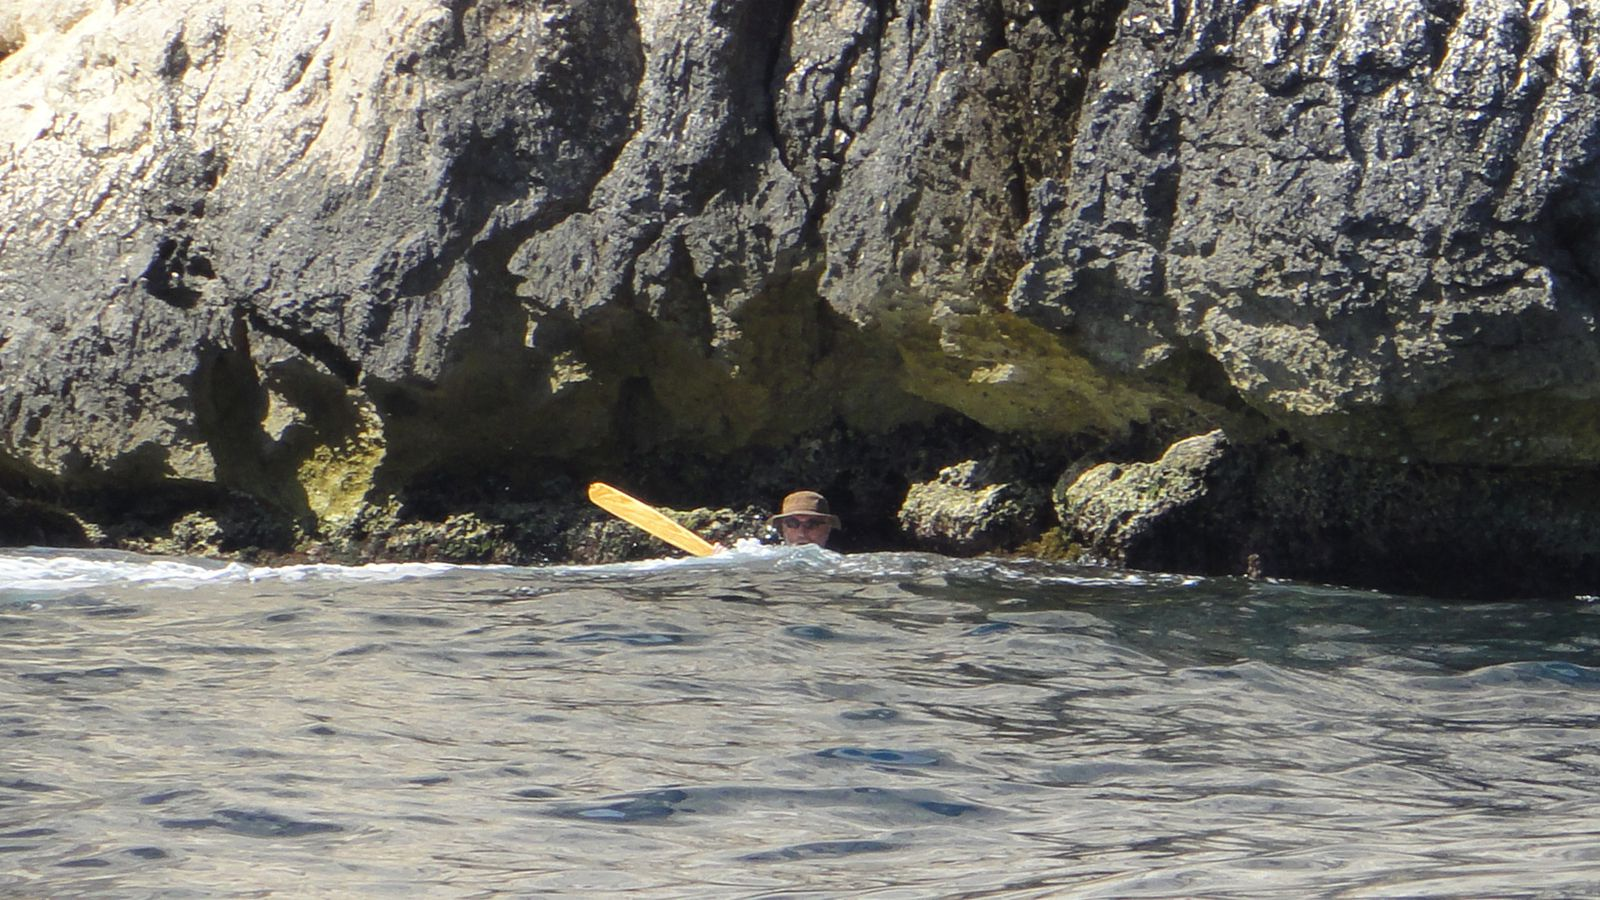 Rando kayak Calanques 2012 Jour 1 : Cassis - Sormiou